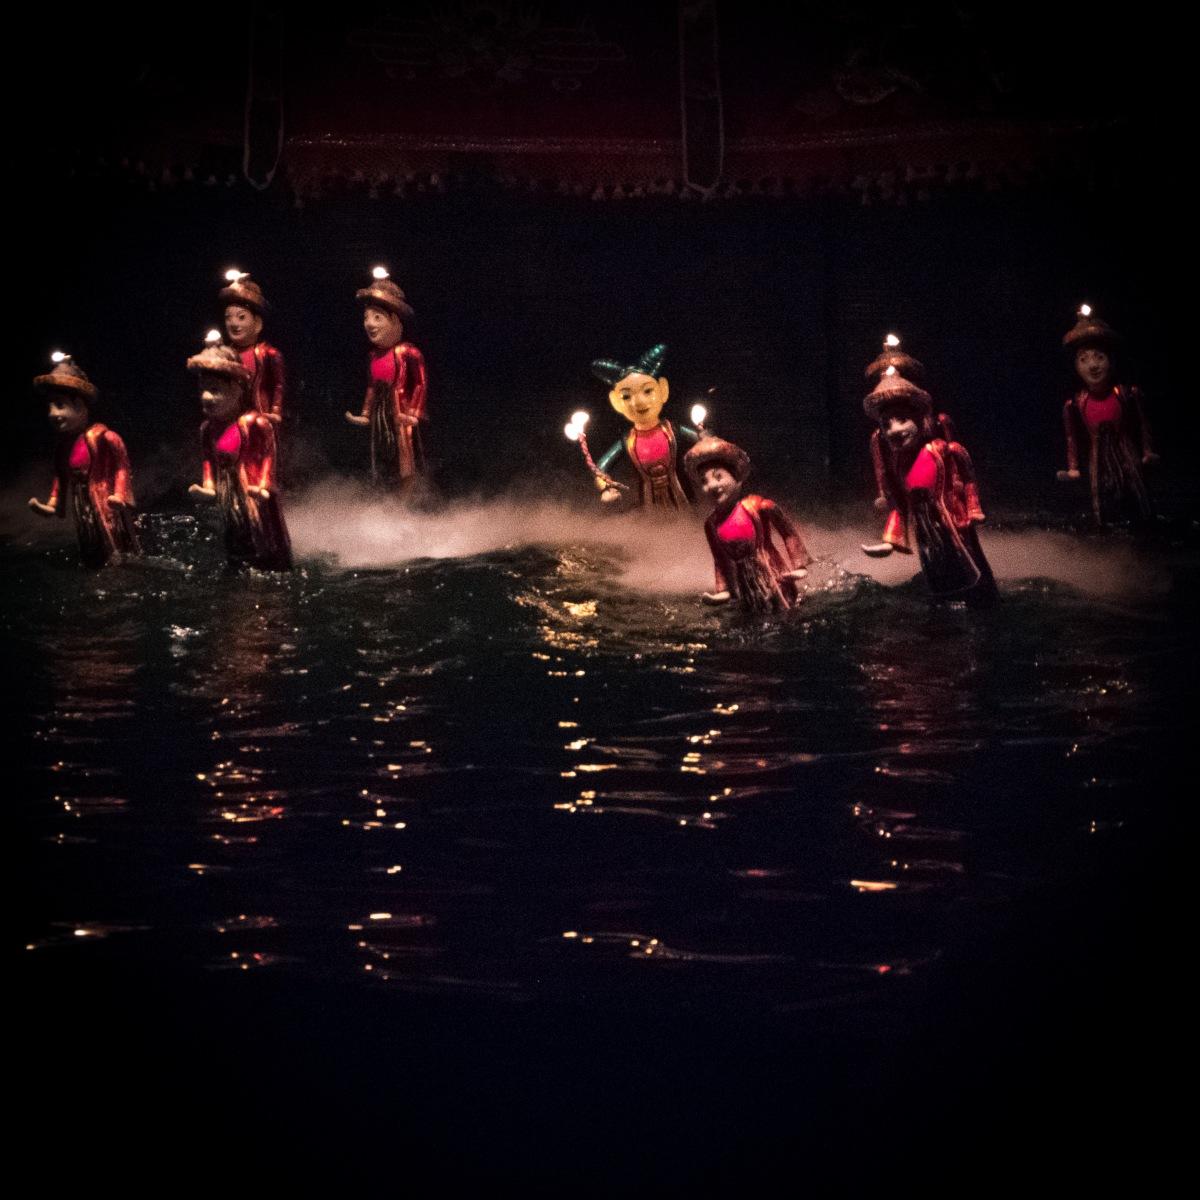 201607 Vietnam13.jpg